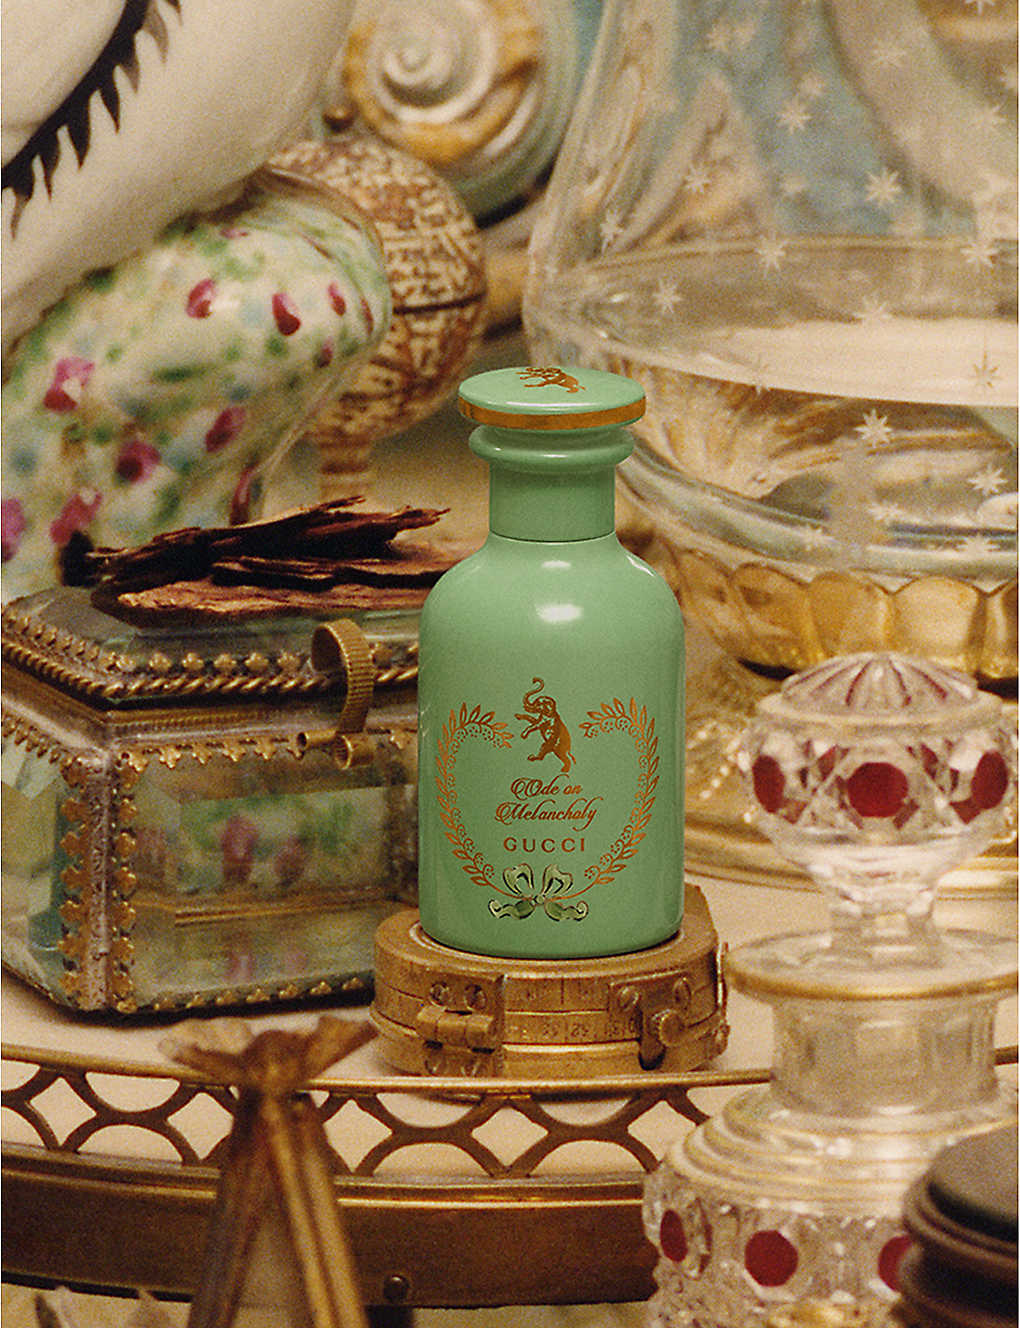 Gucci-The-Alchemist-Garden-Ode-on-Melancholy-Perfumed-Oil-20ml-01